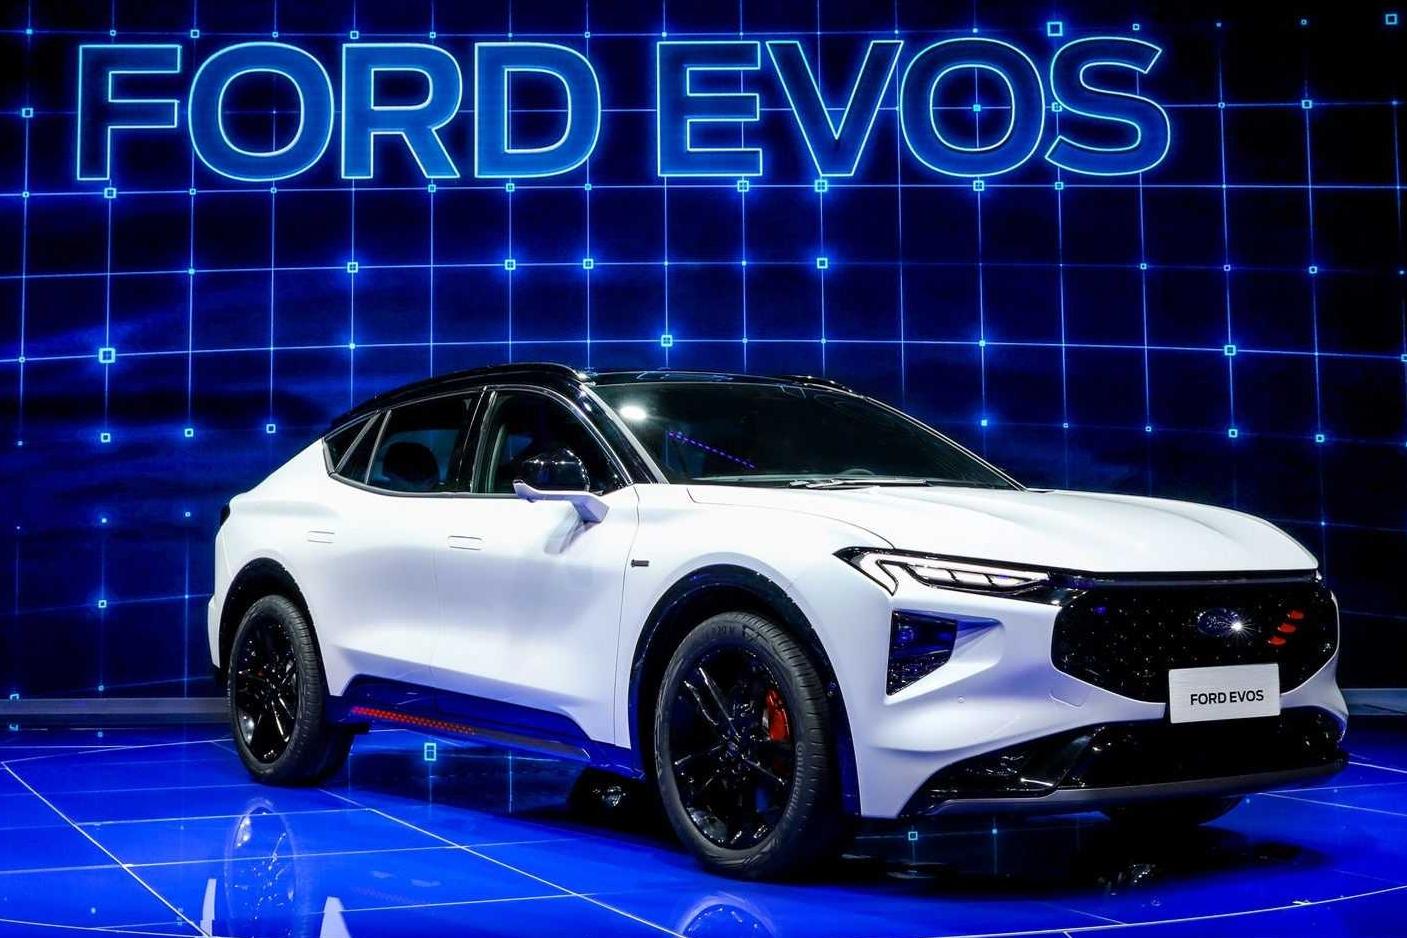 2021-ford-evos-cn